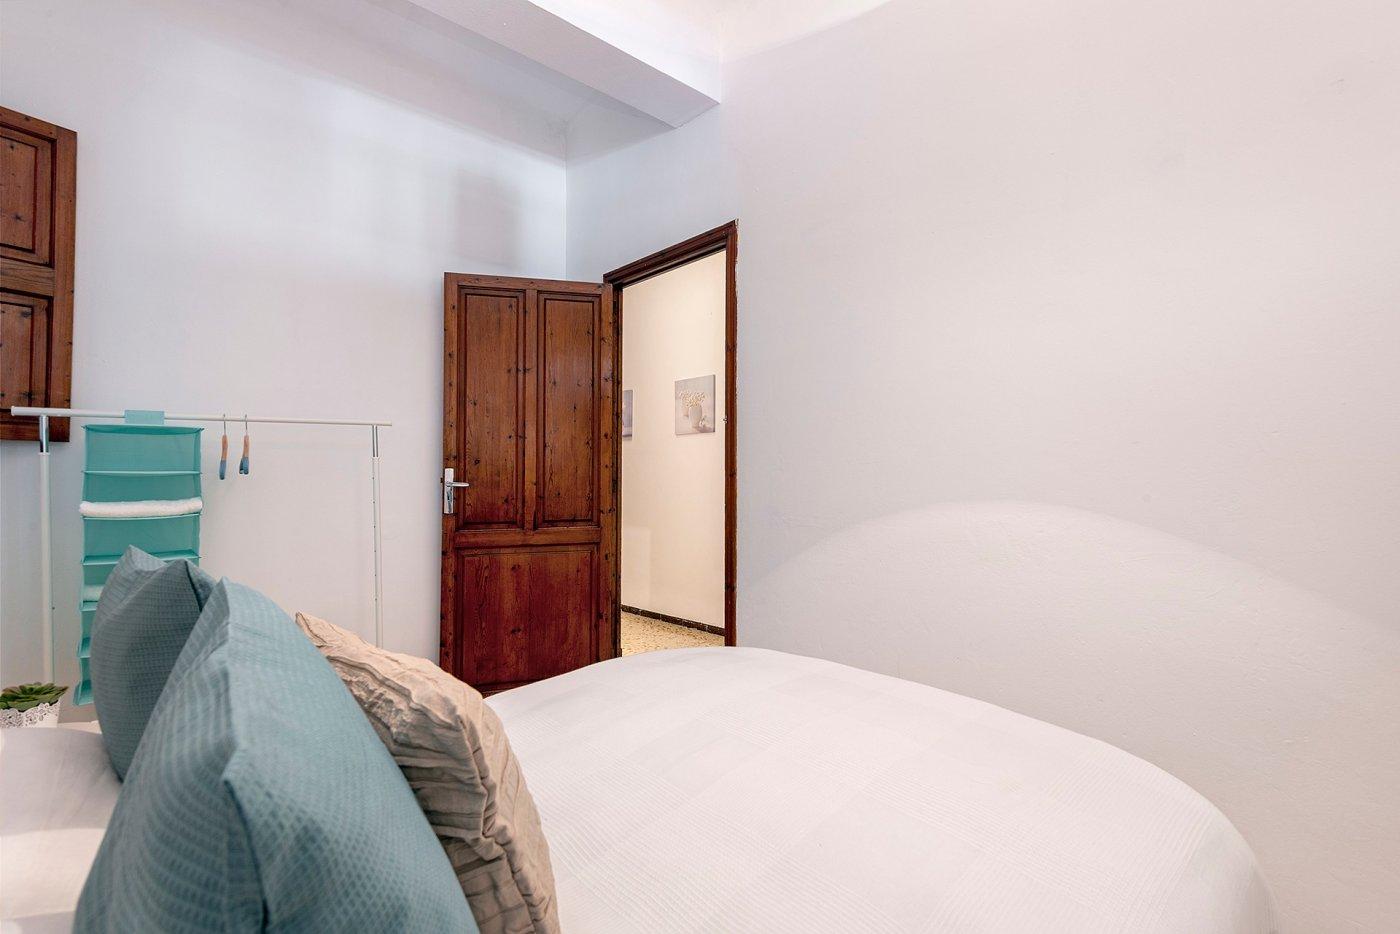 Centrico piso en venta. porta sant antoni. palma mallorca. - imagenInmueble14